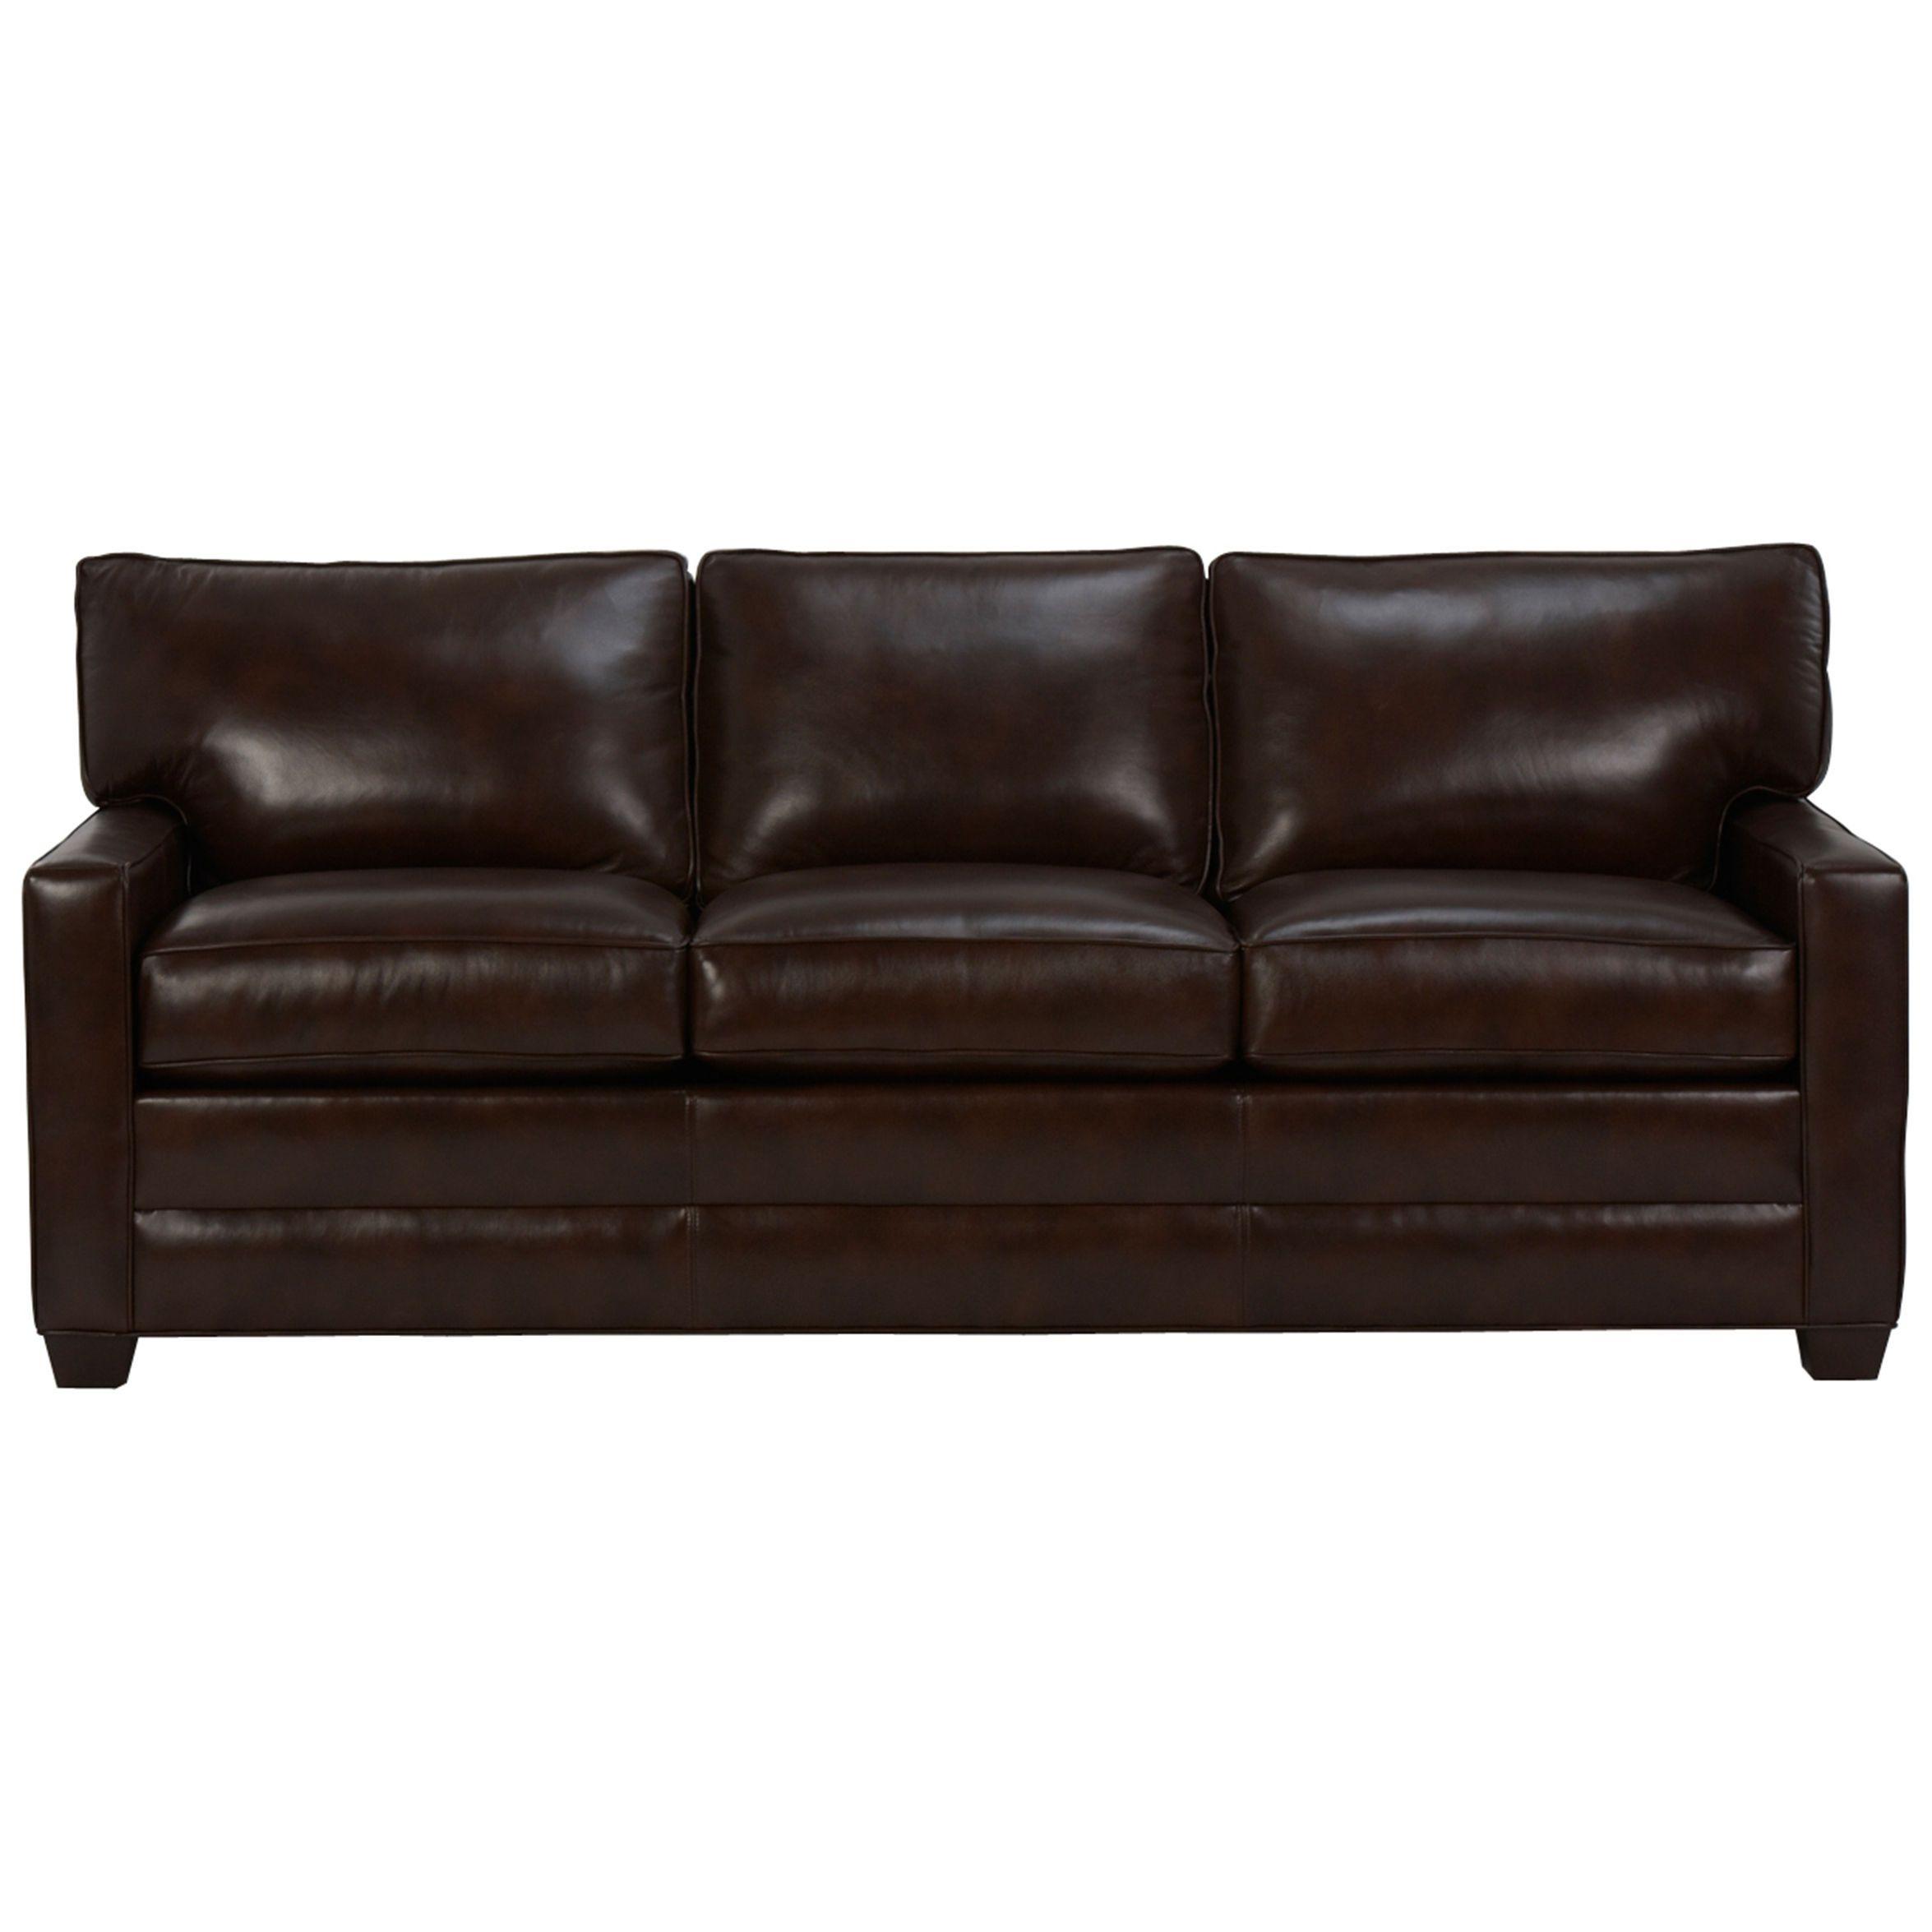 Bennett Three Cushion Track Arm Leather Sofas Ethan Allen Us